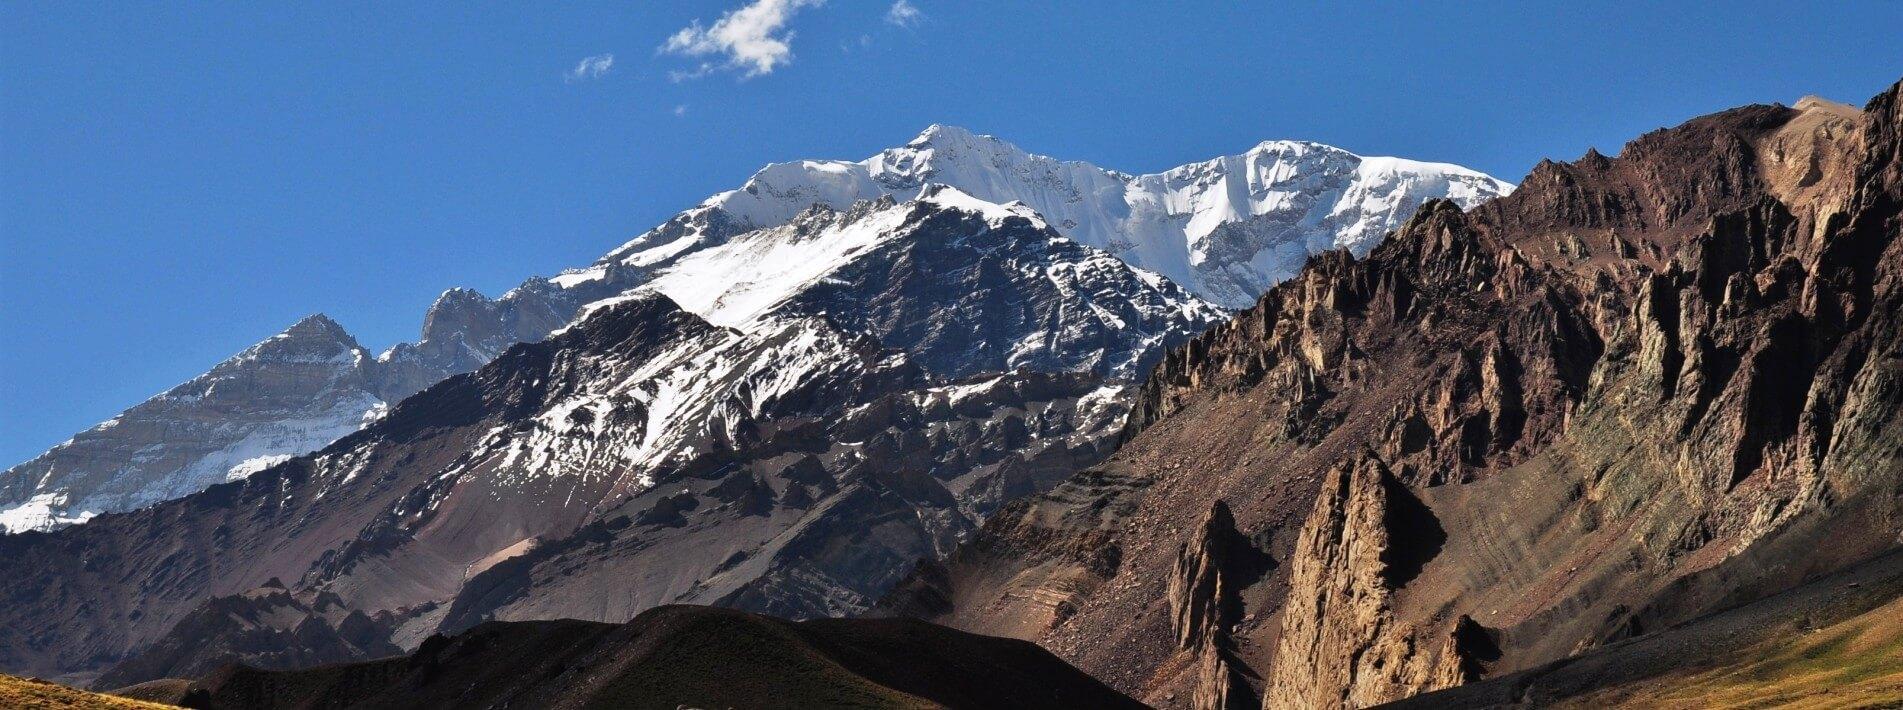 Traumhafte Bergwelt Anden